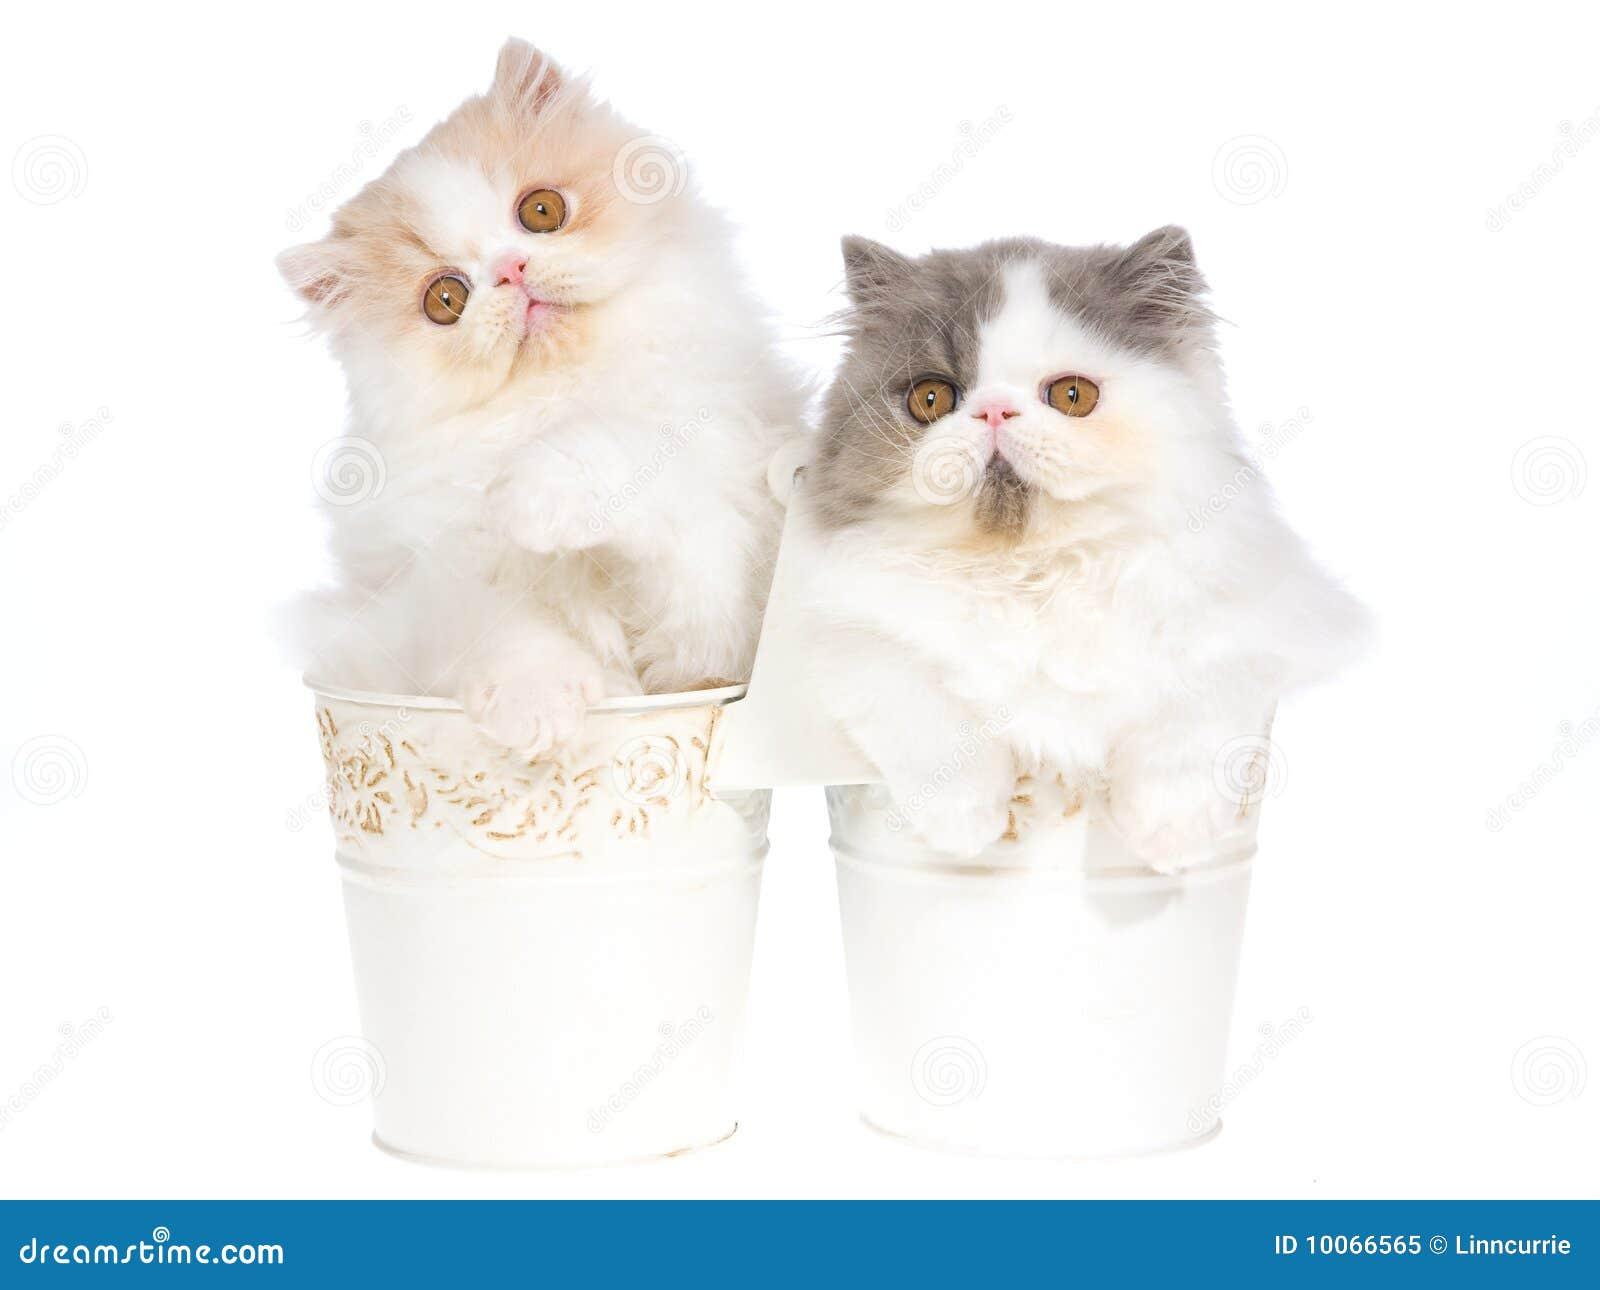 sentry calming collar for cats reviews